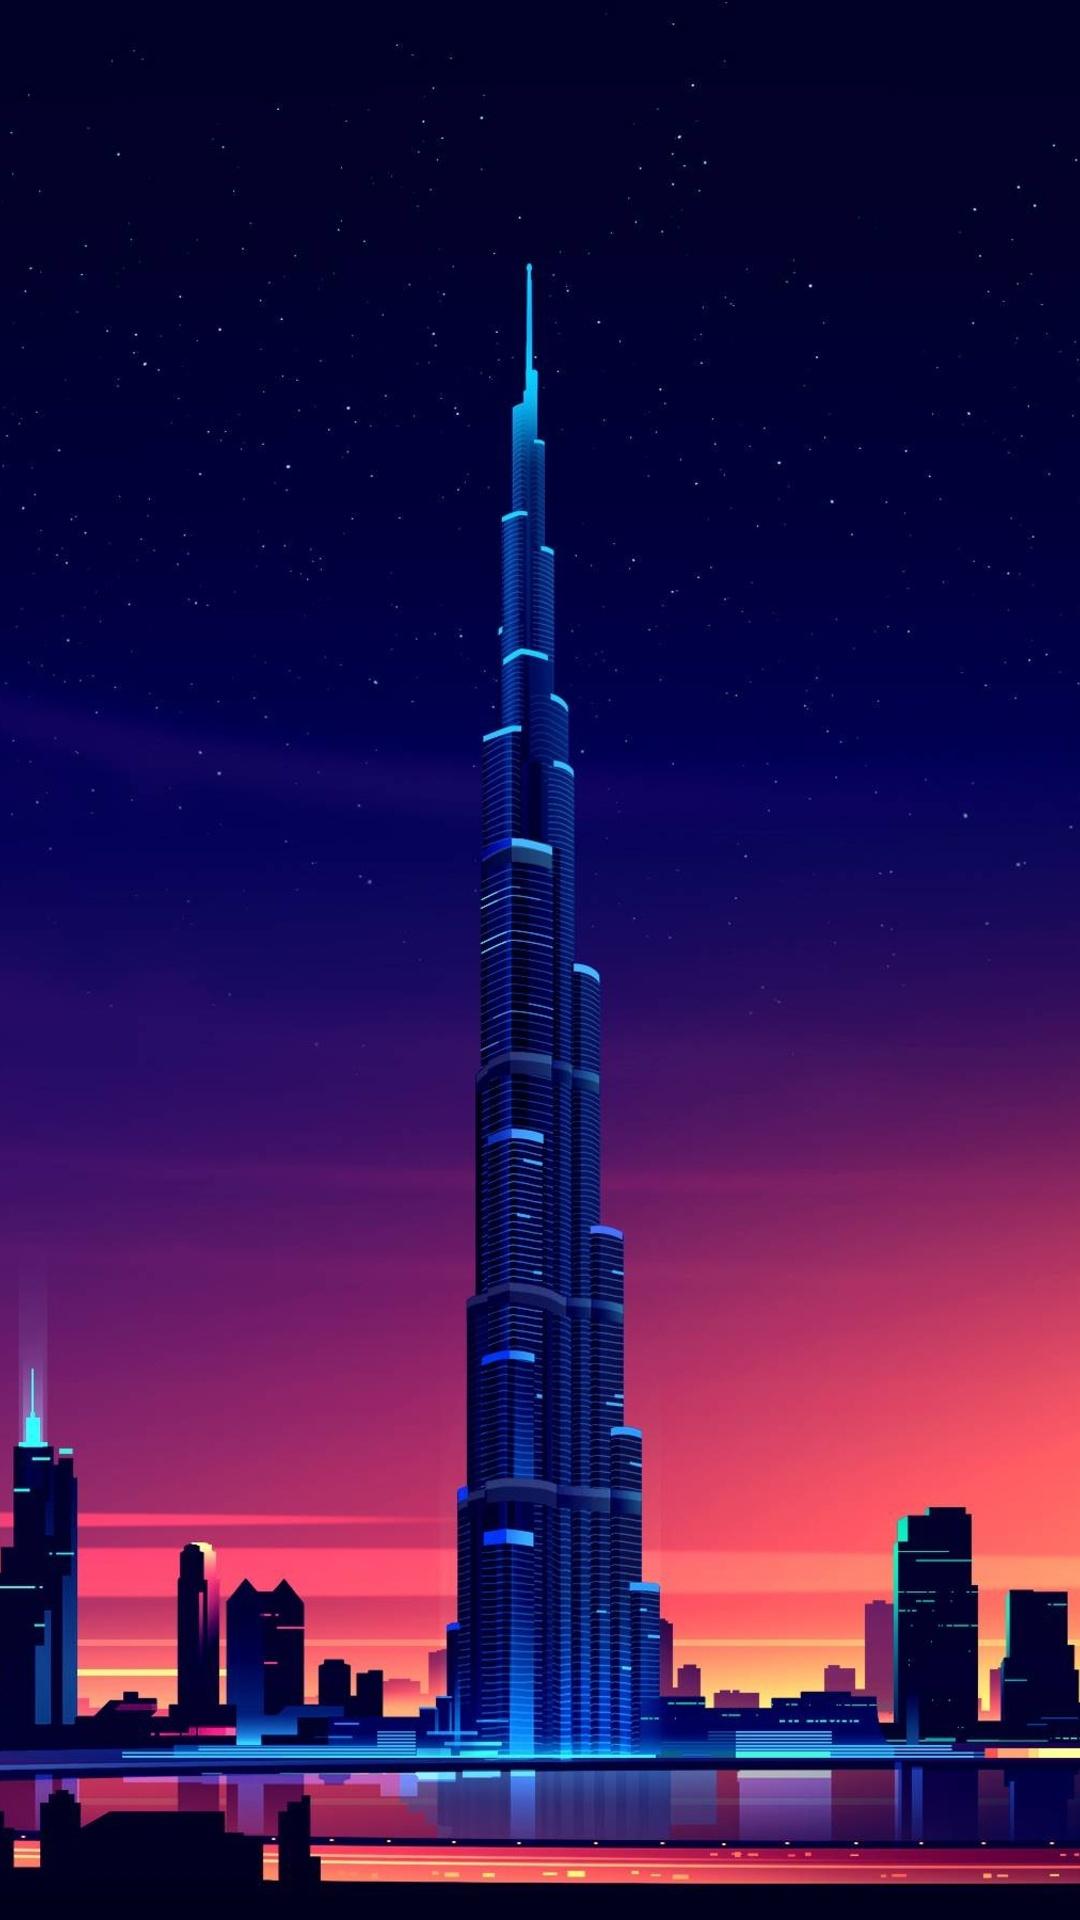 1080x1920 dubai burj khalifa minimalist iphone 7 6s 6 plus pixel xl one plus 3 3t 5 hd 4k - Dubai burj khalifa hd photos ...